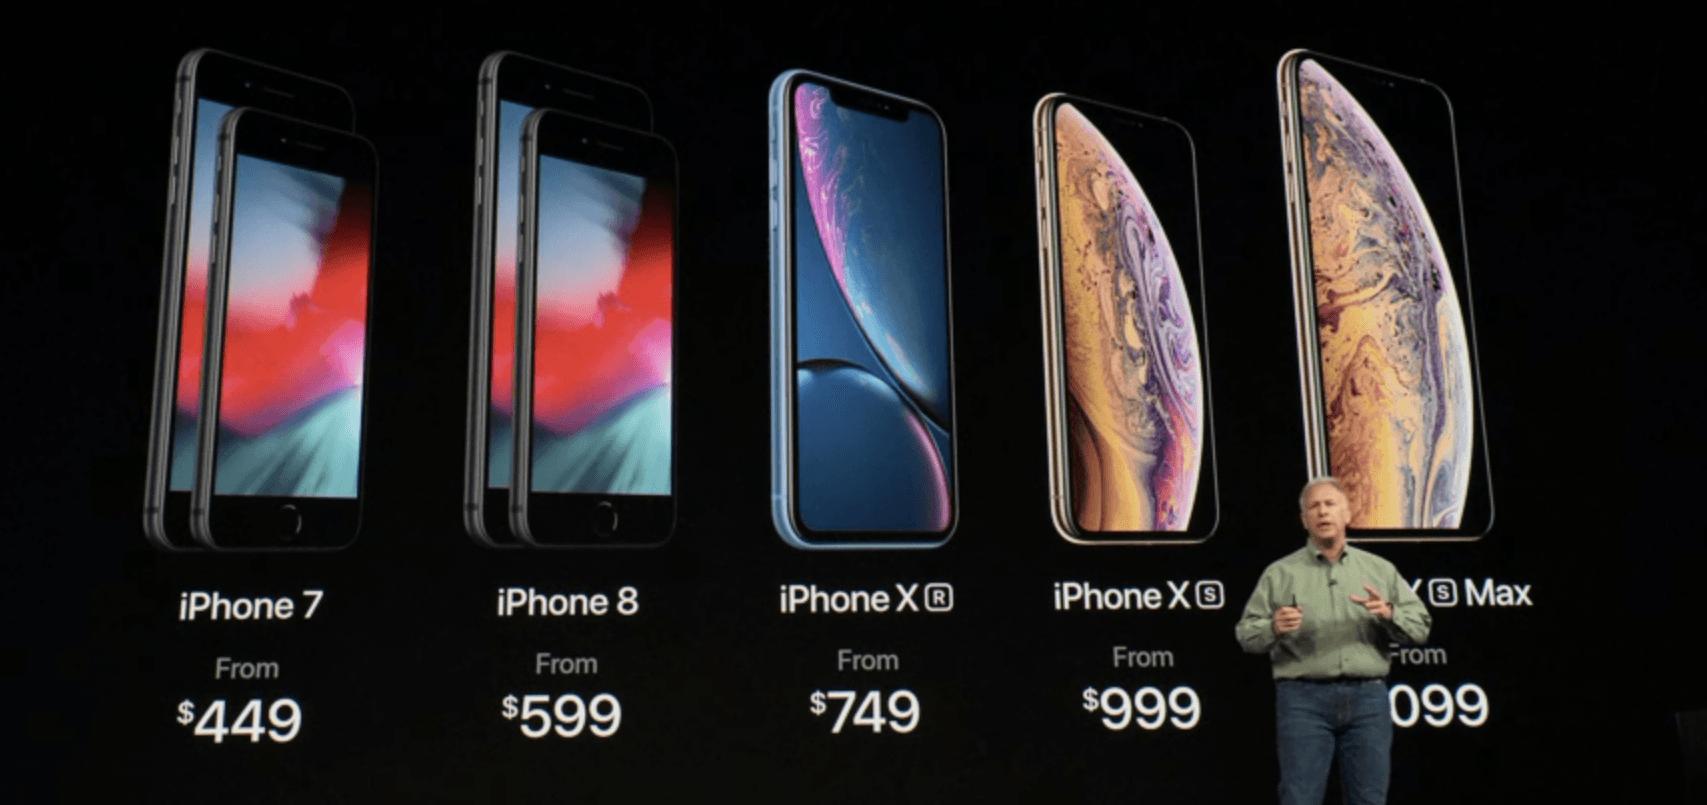 Iphonexr8